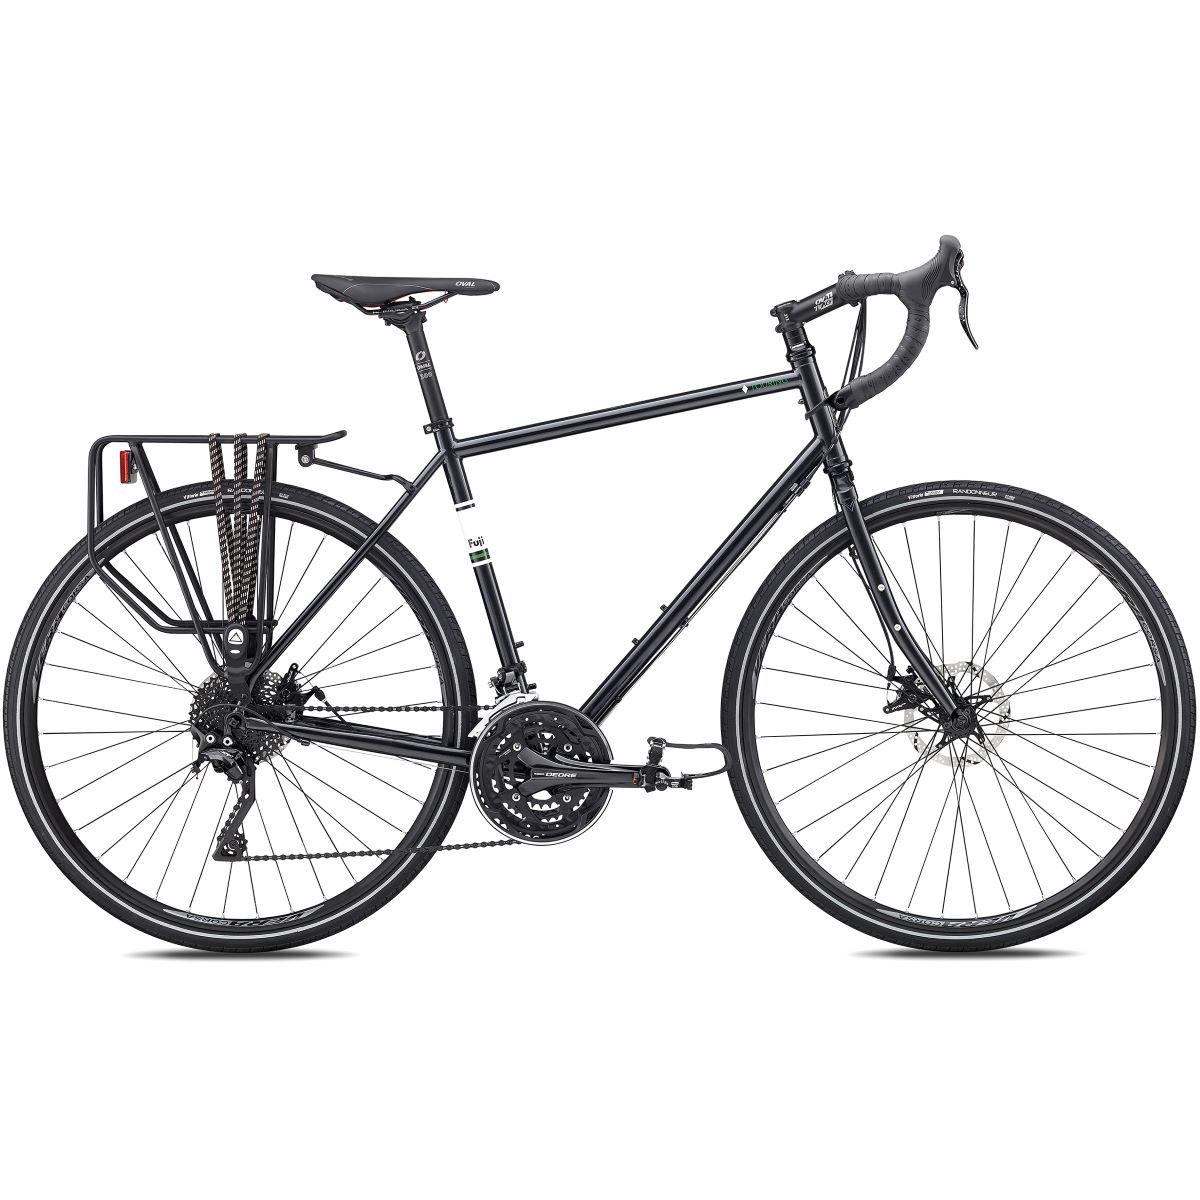 Fuji Touring Disc 2020 Touring Bikes